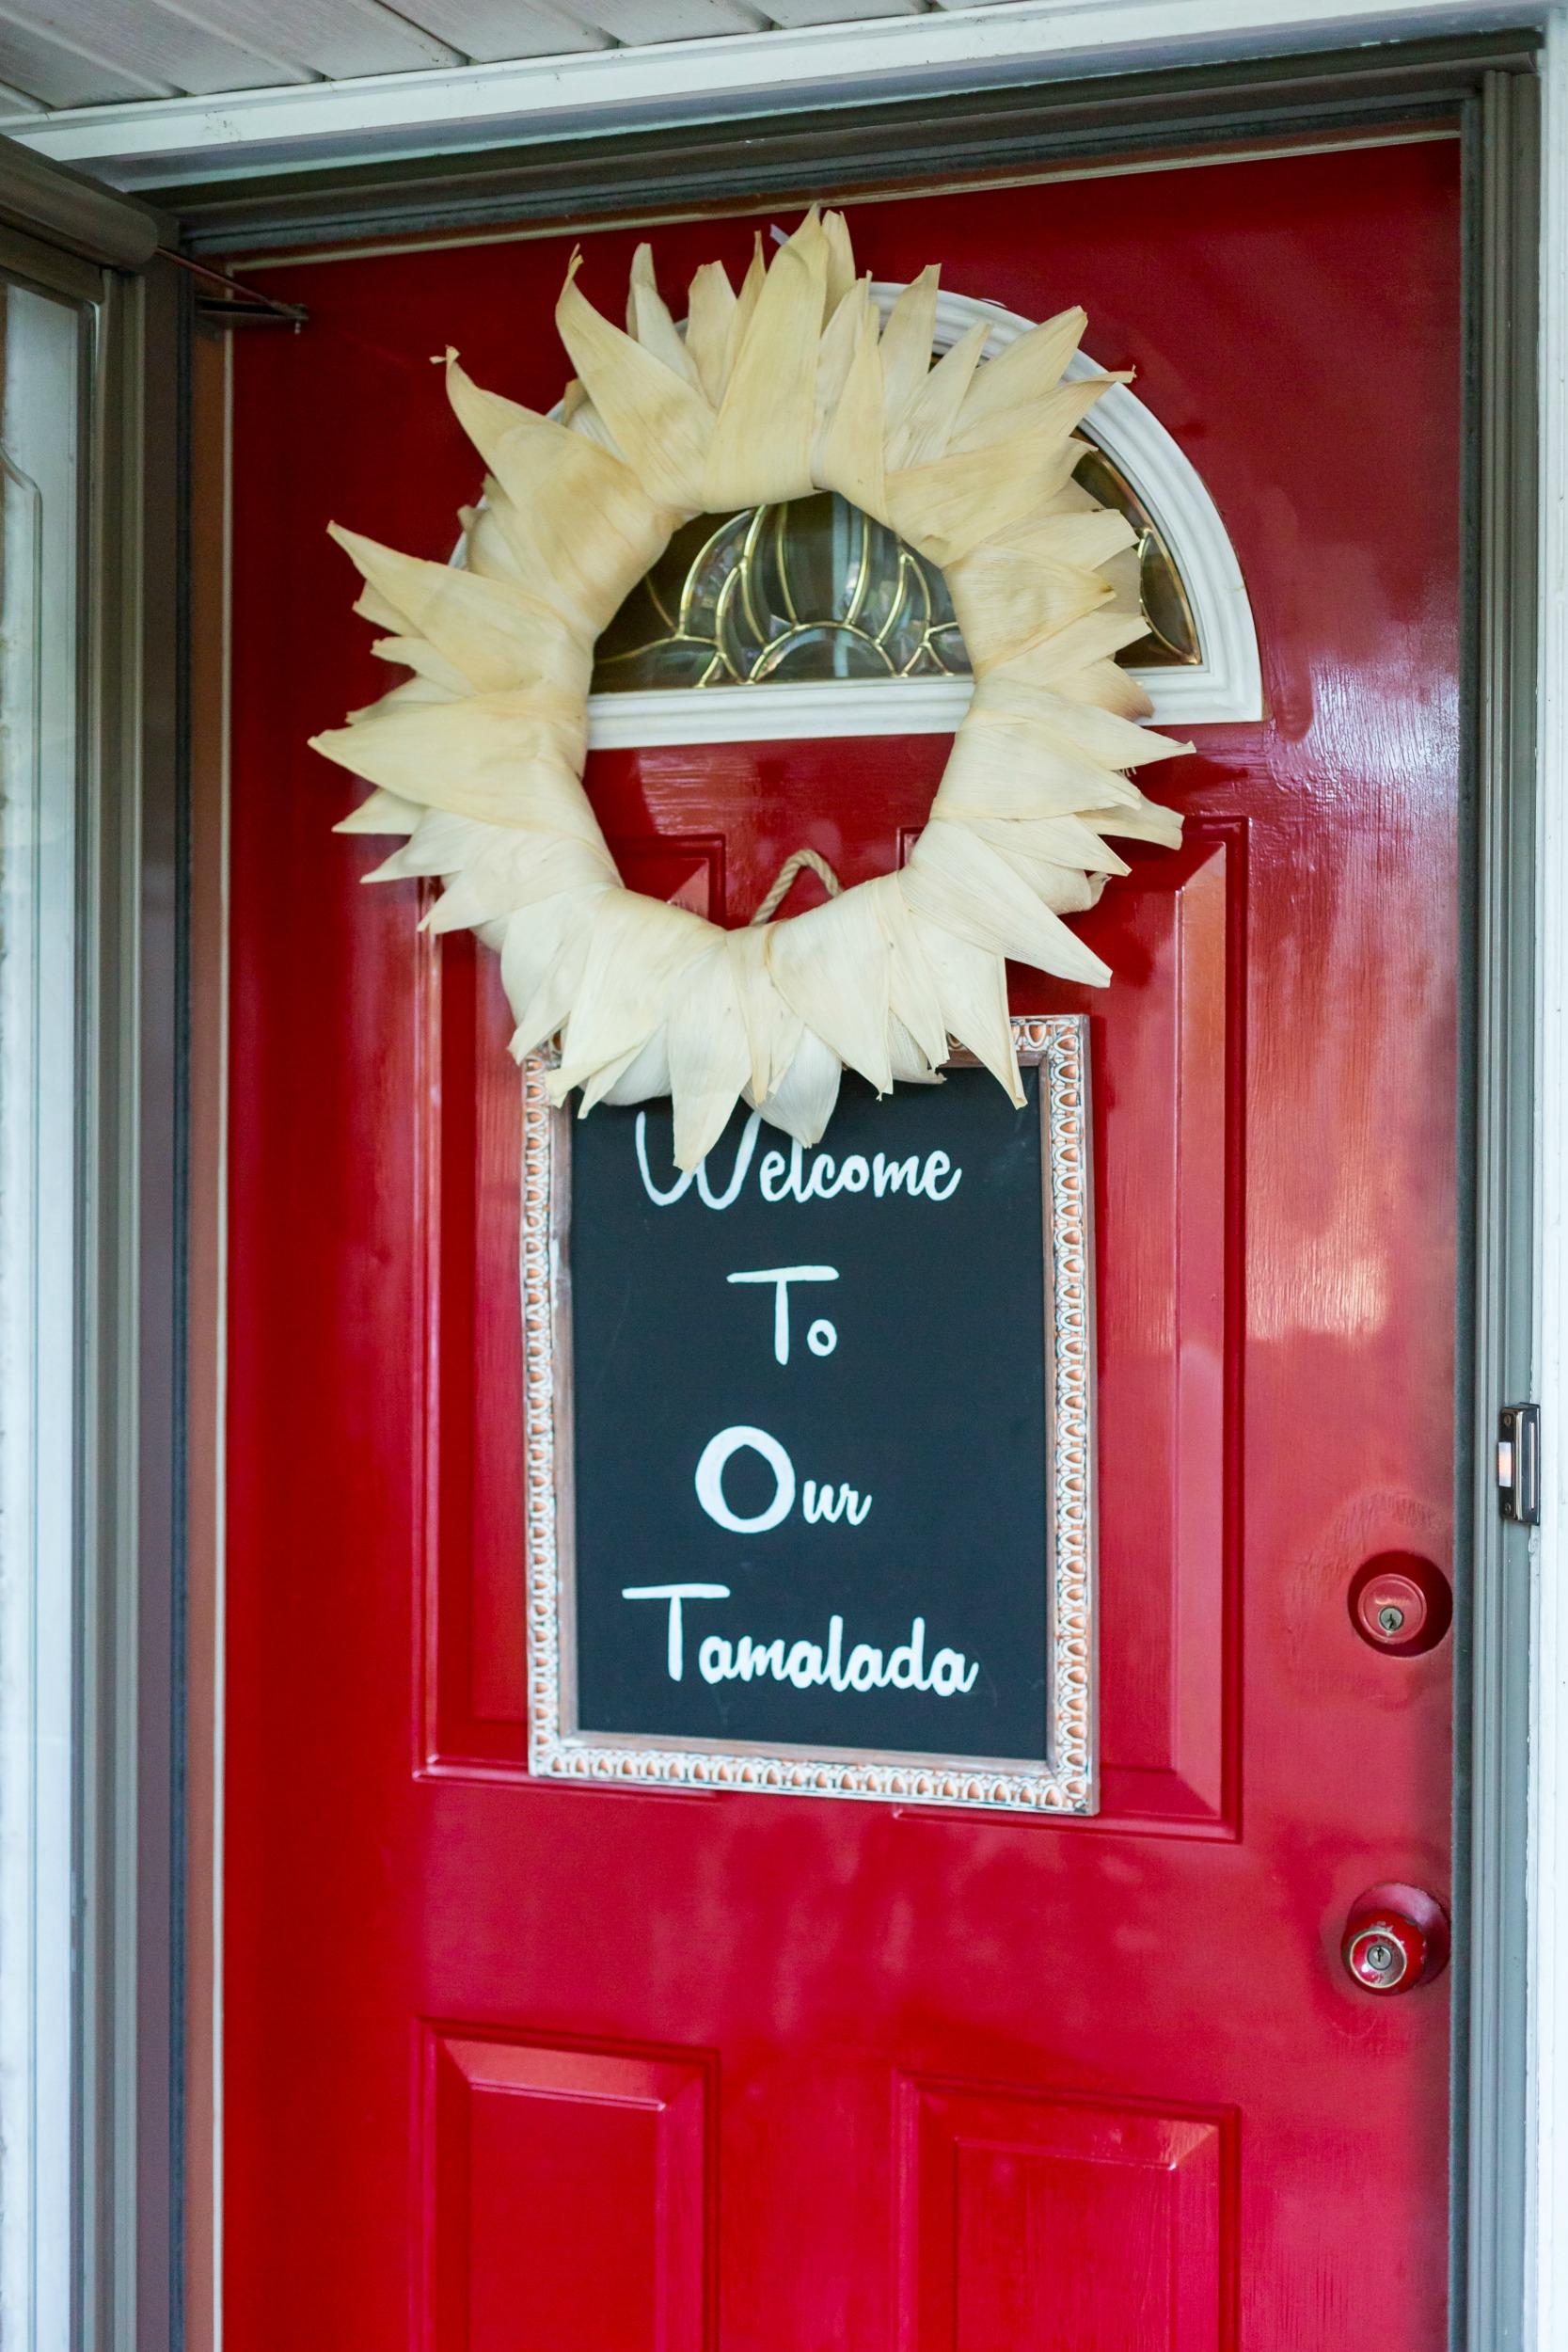 how-to-host-a-tamalada-vianneyrodriguez-sweetlifebake